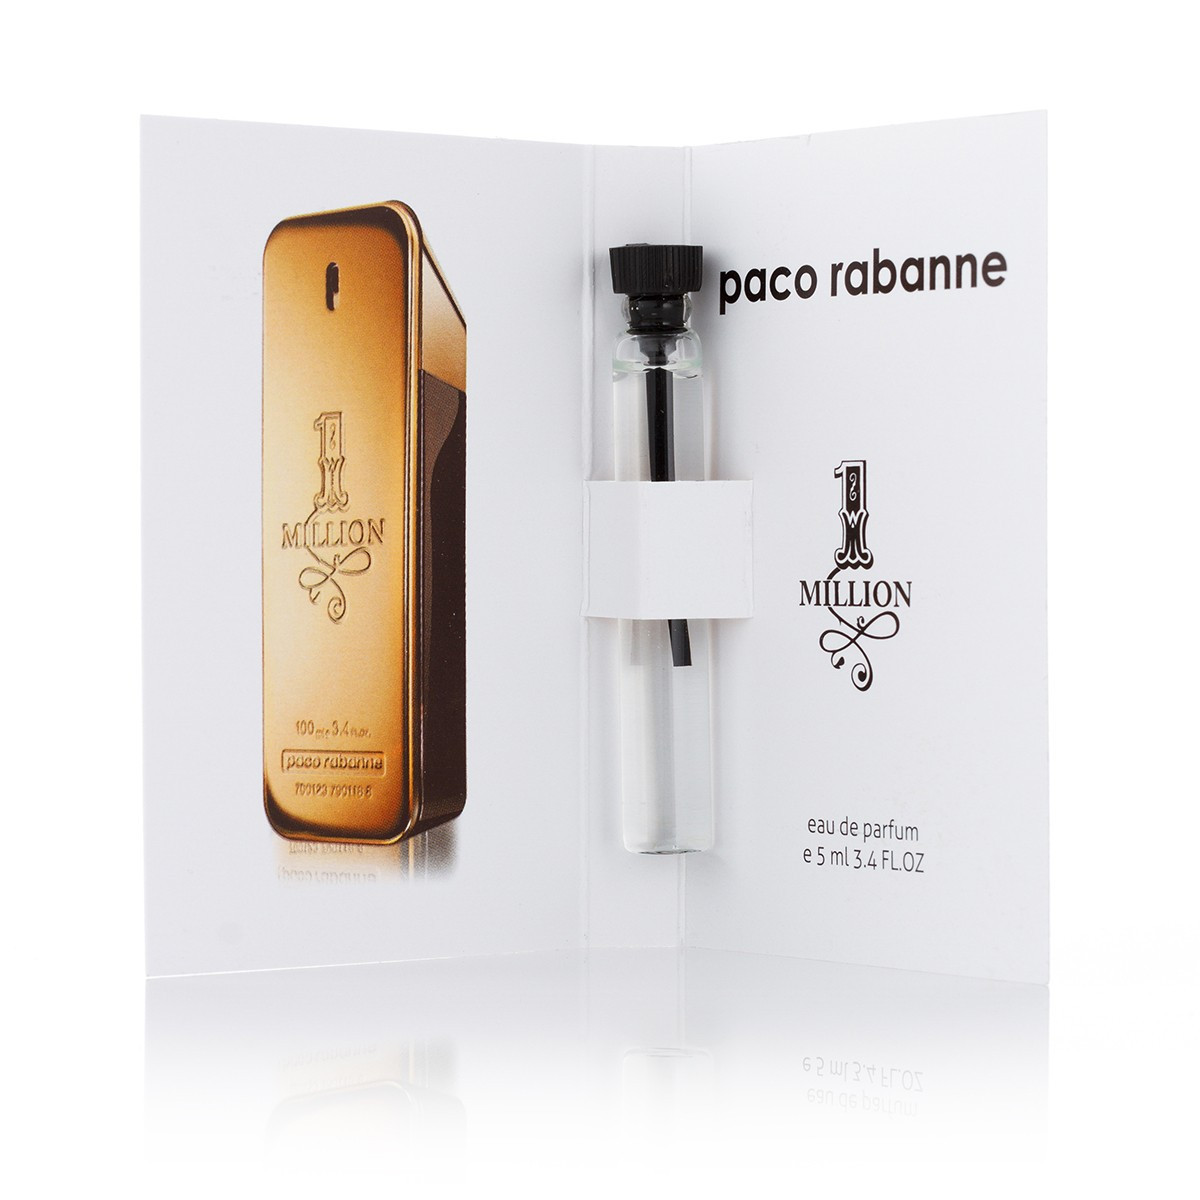 Paco Rabanne 1 Million - Sample 5ml